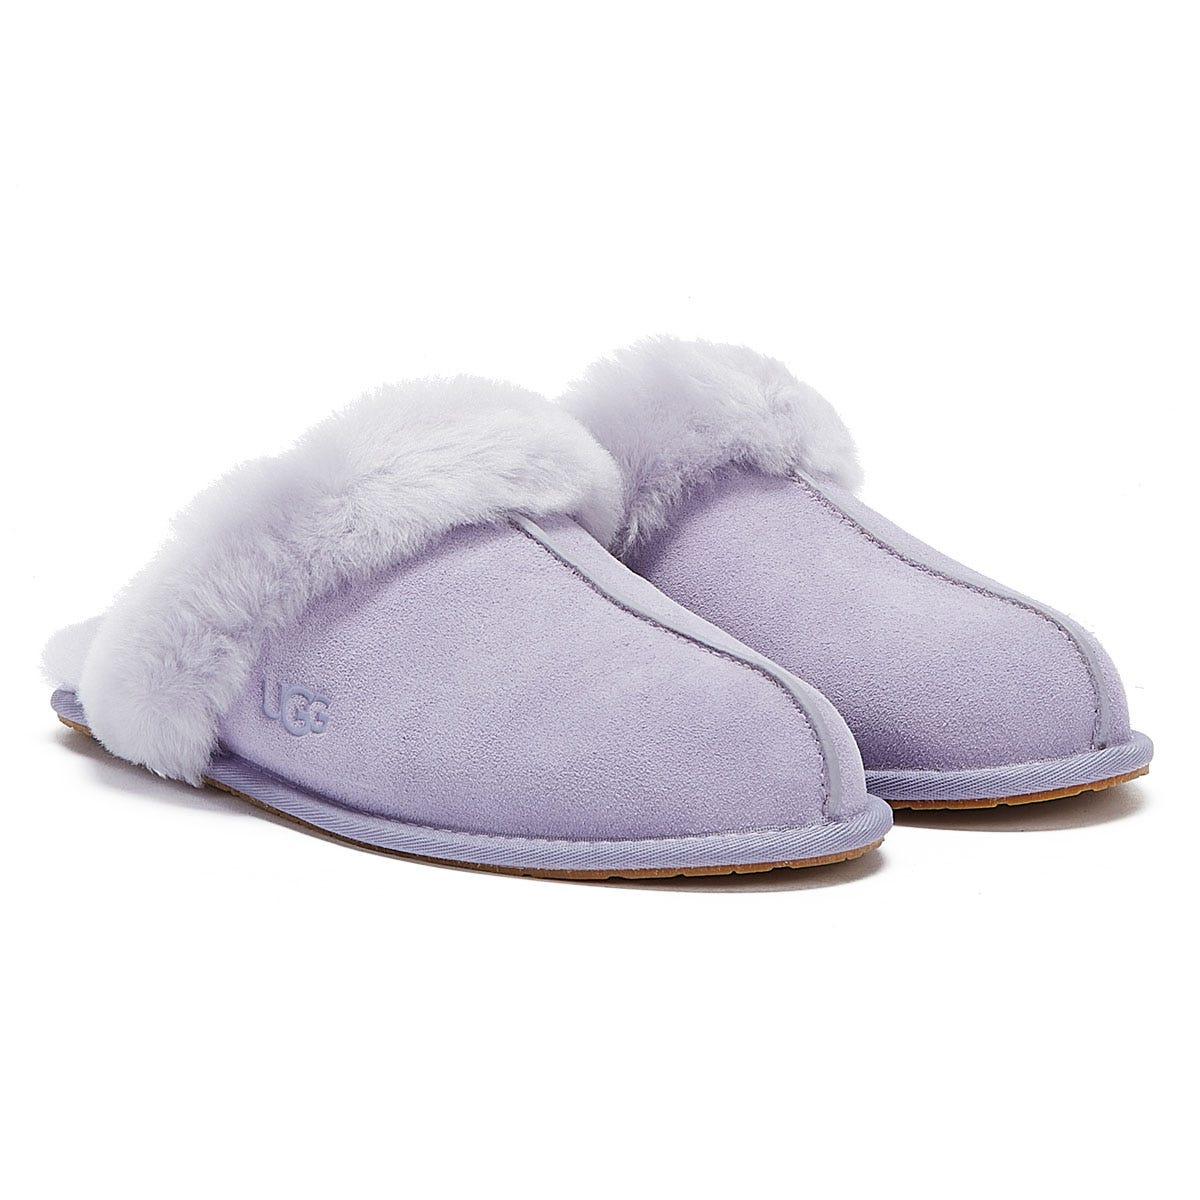 UGG Scuffette II Womens Light Purple Slippers UK 3